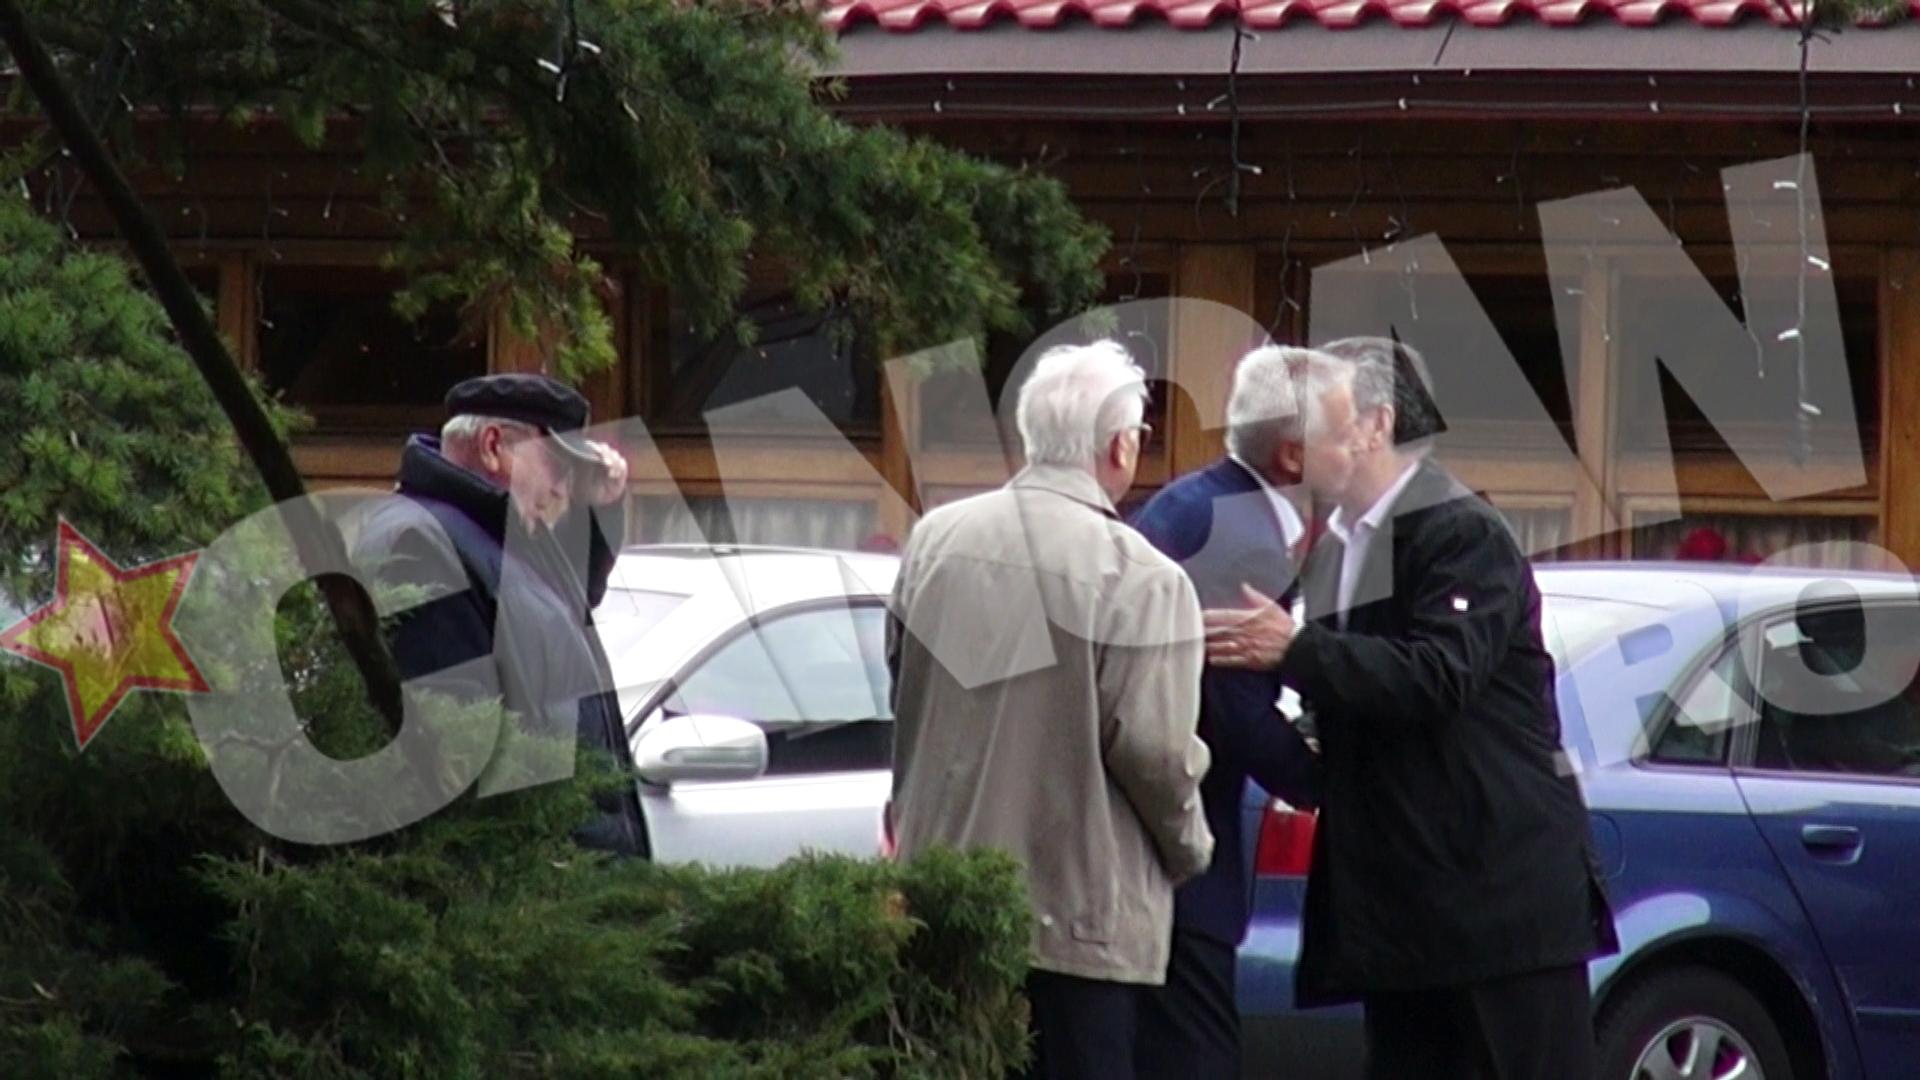 Generalii l-au primit cu strangeri calduroase de maini si imbratisari prietenesti pe cuscrul lui Basescu